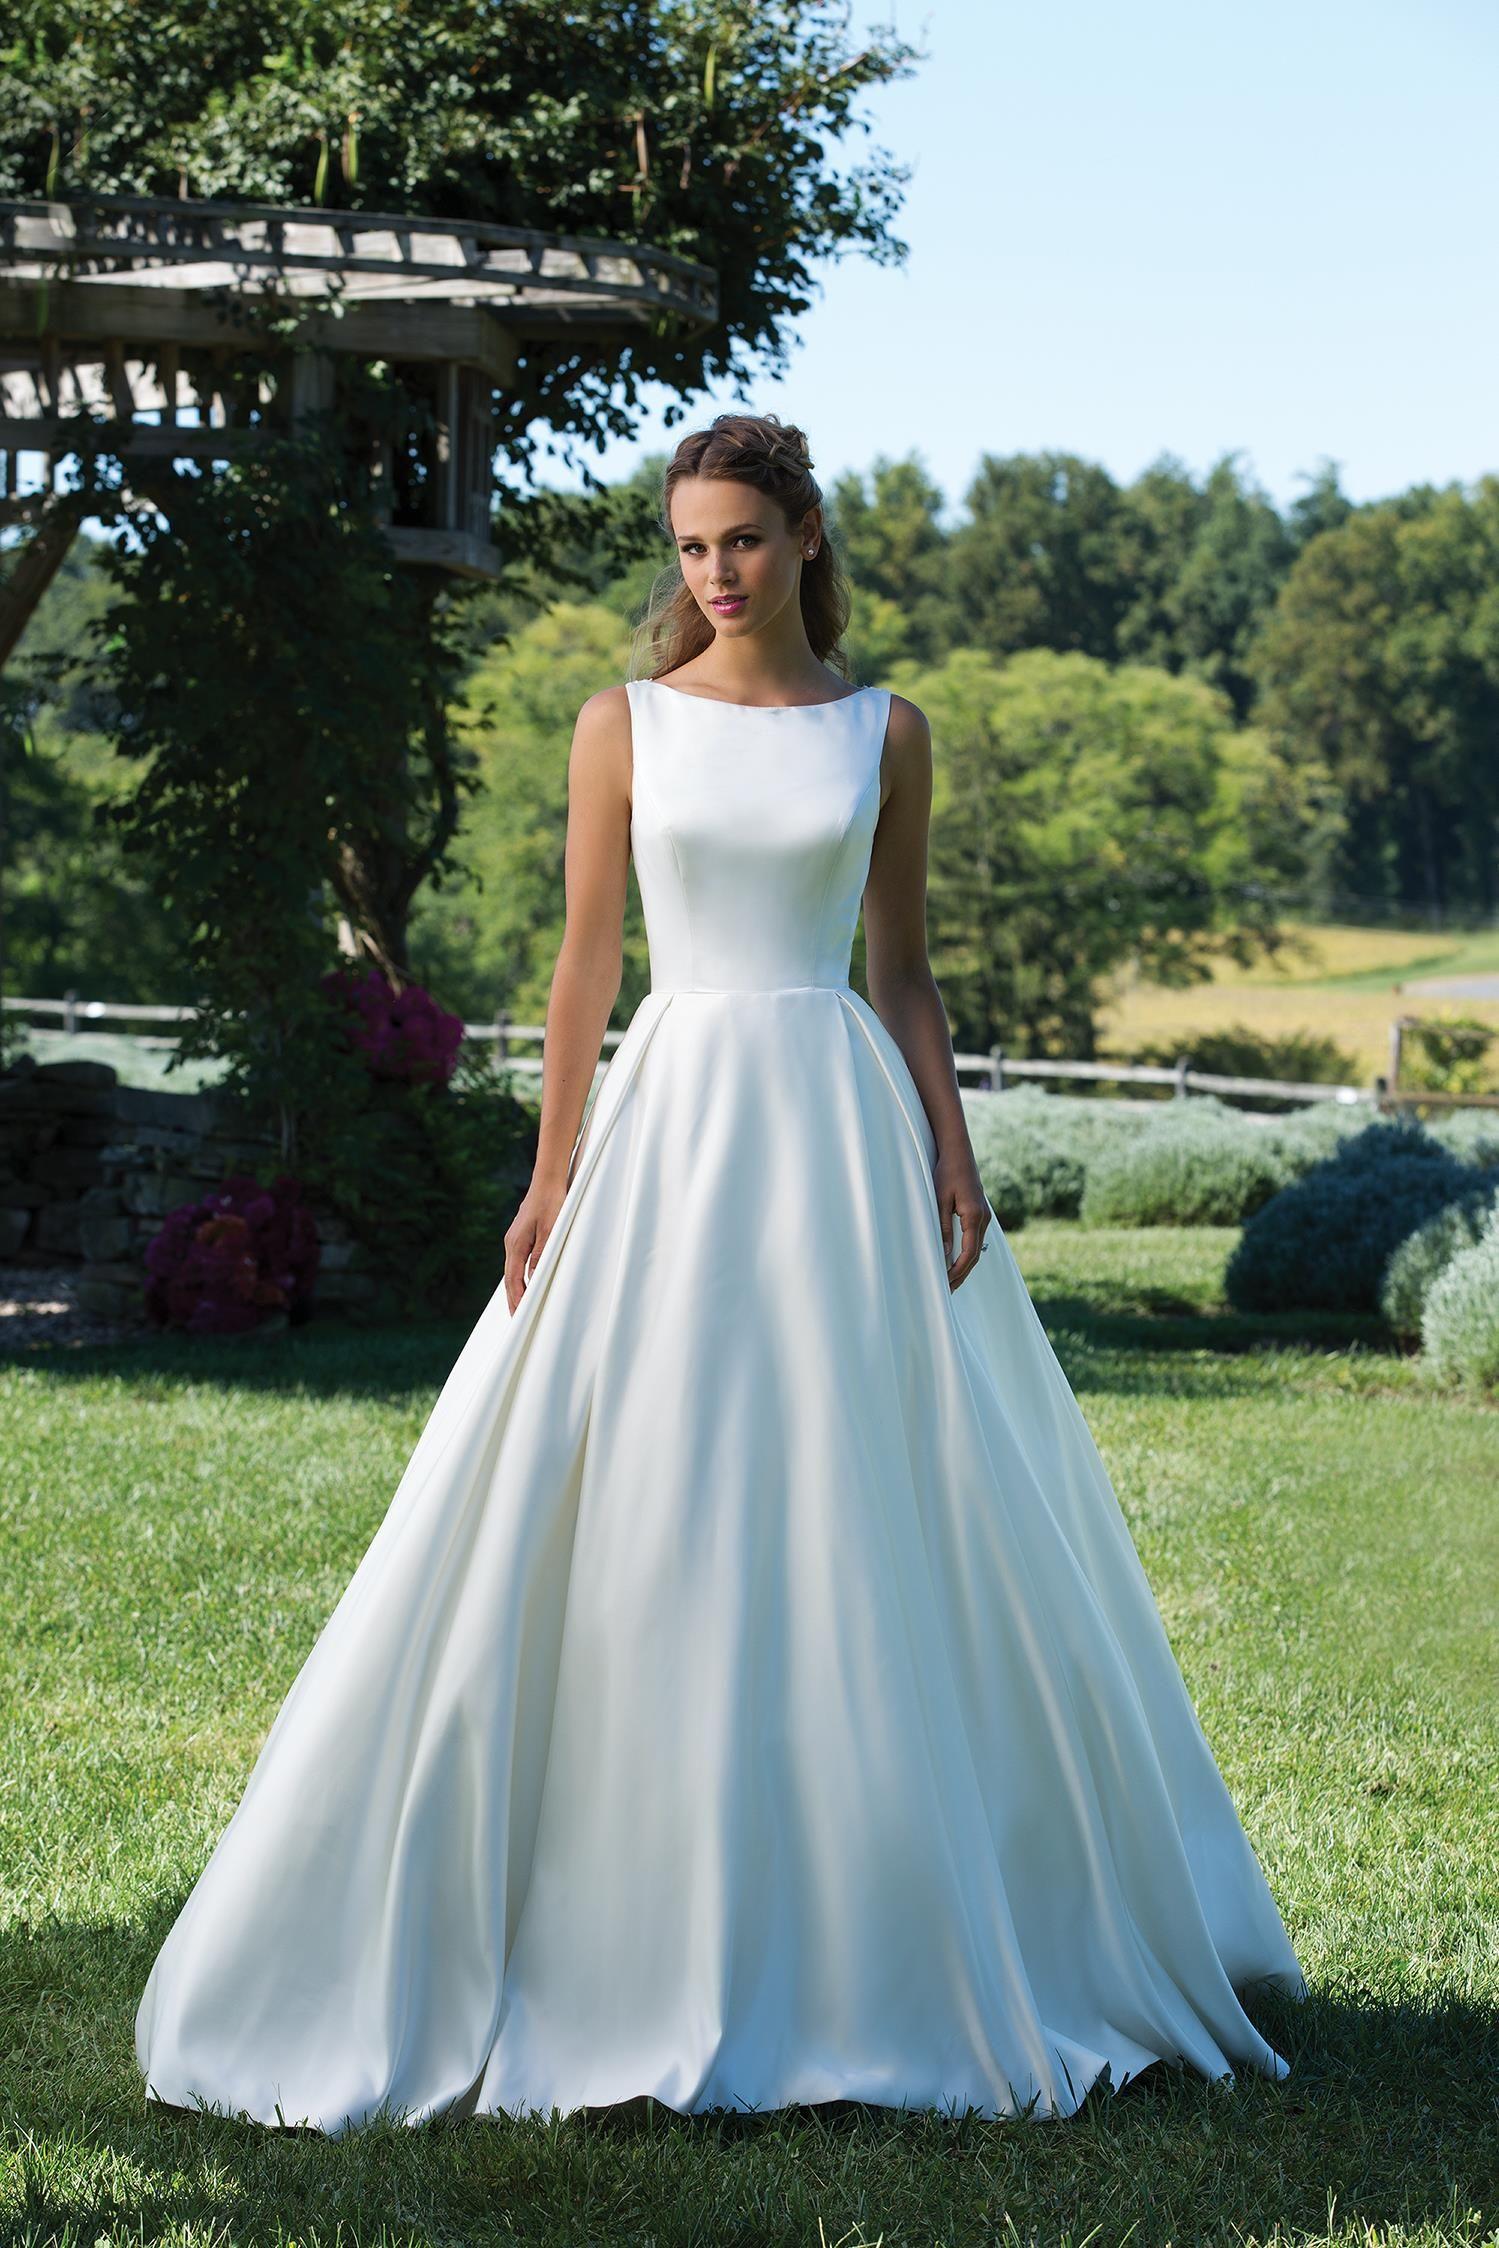 Svadobné šaty svadobný salon valery 6be3fd10e4a